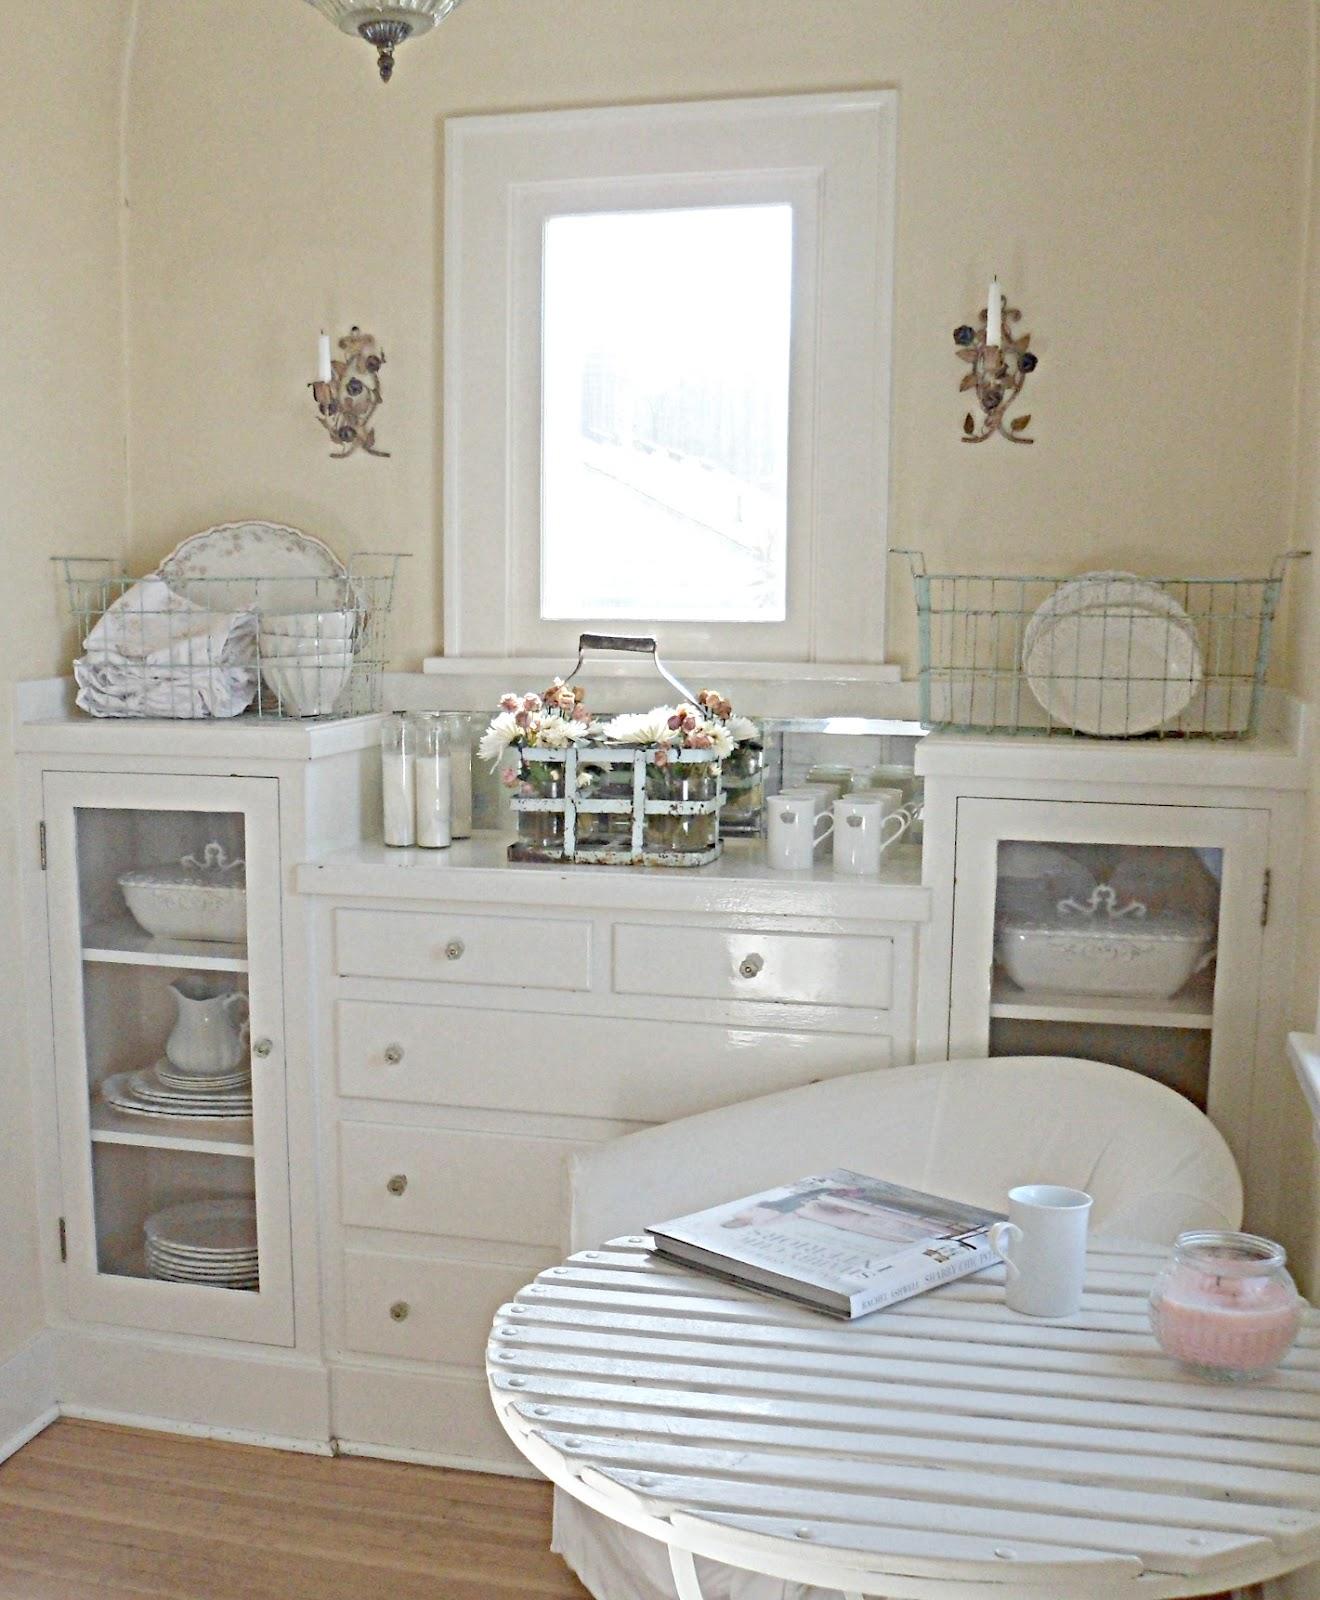 Shabby french for me my kitchen nook - Kitchen nooks ...